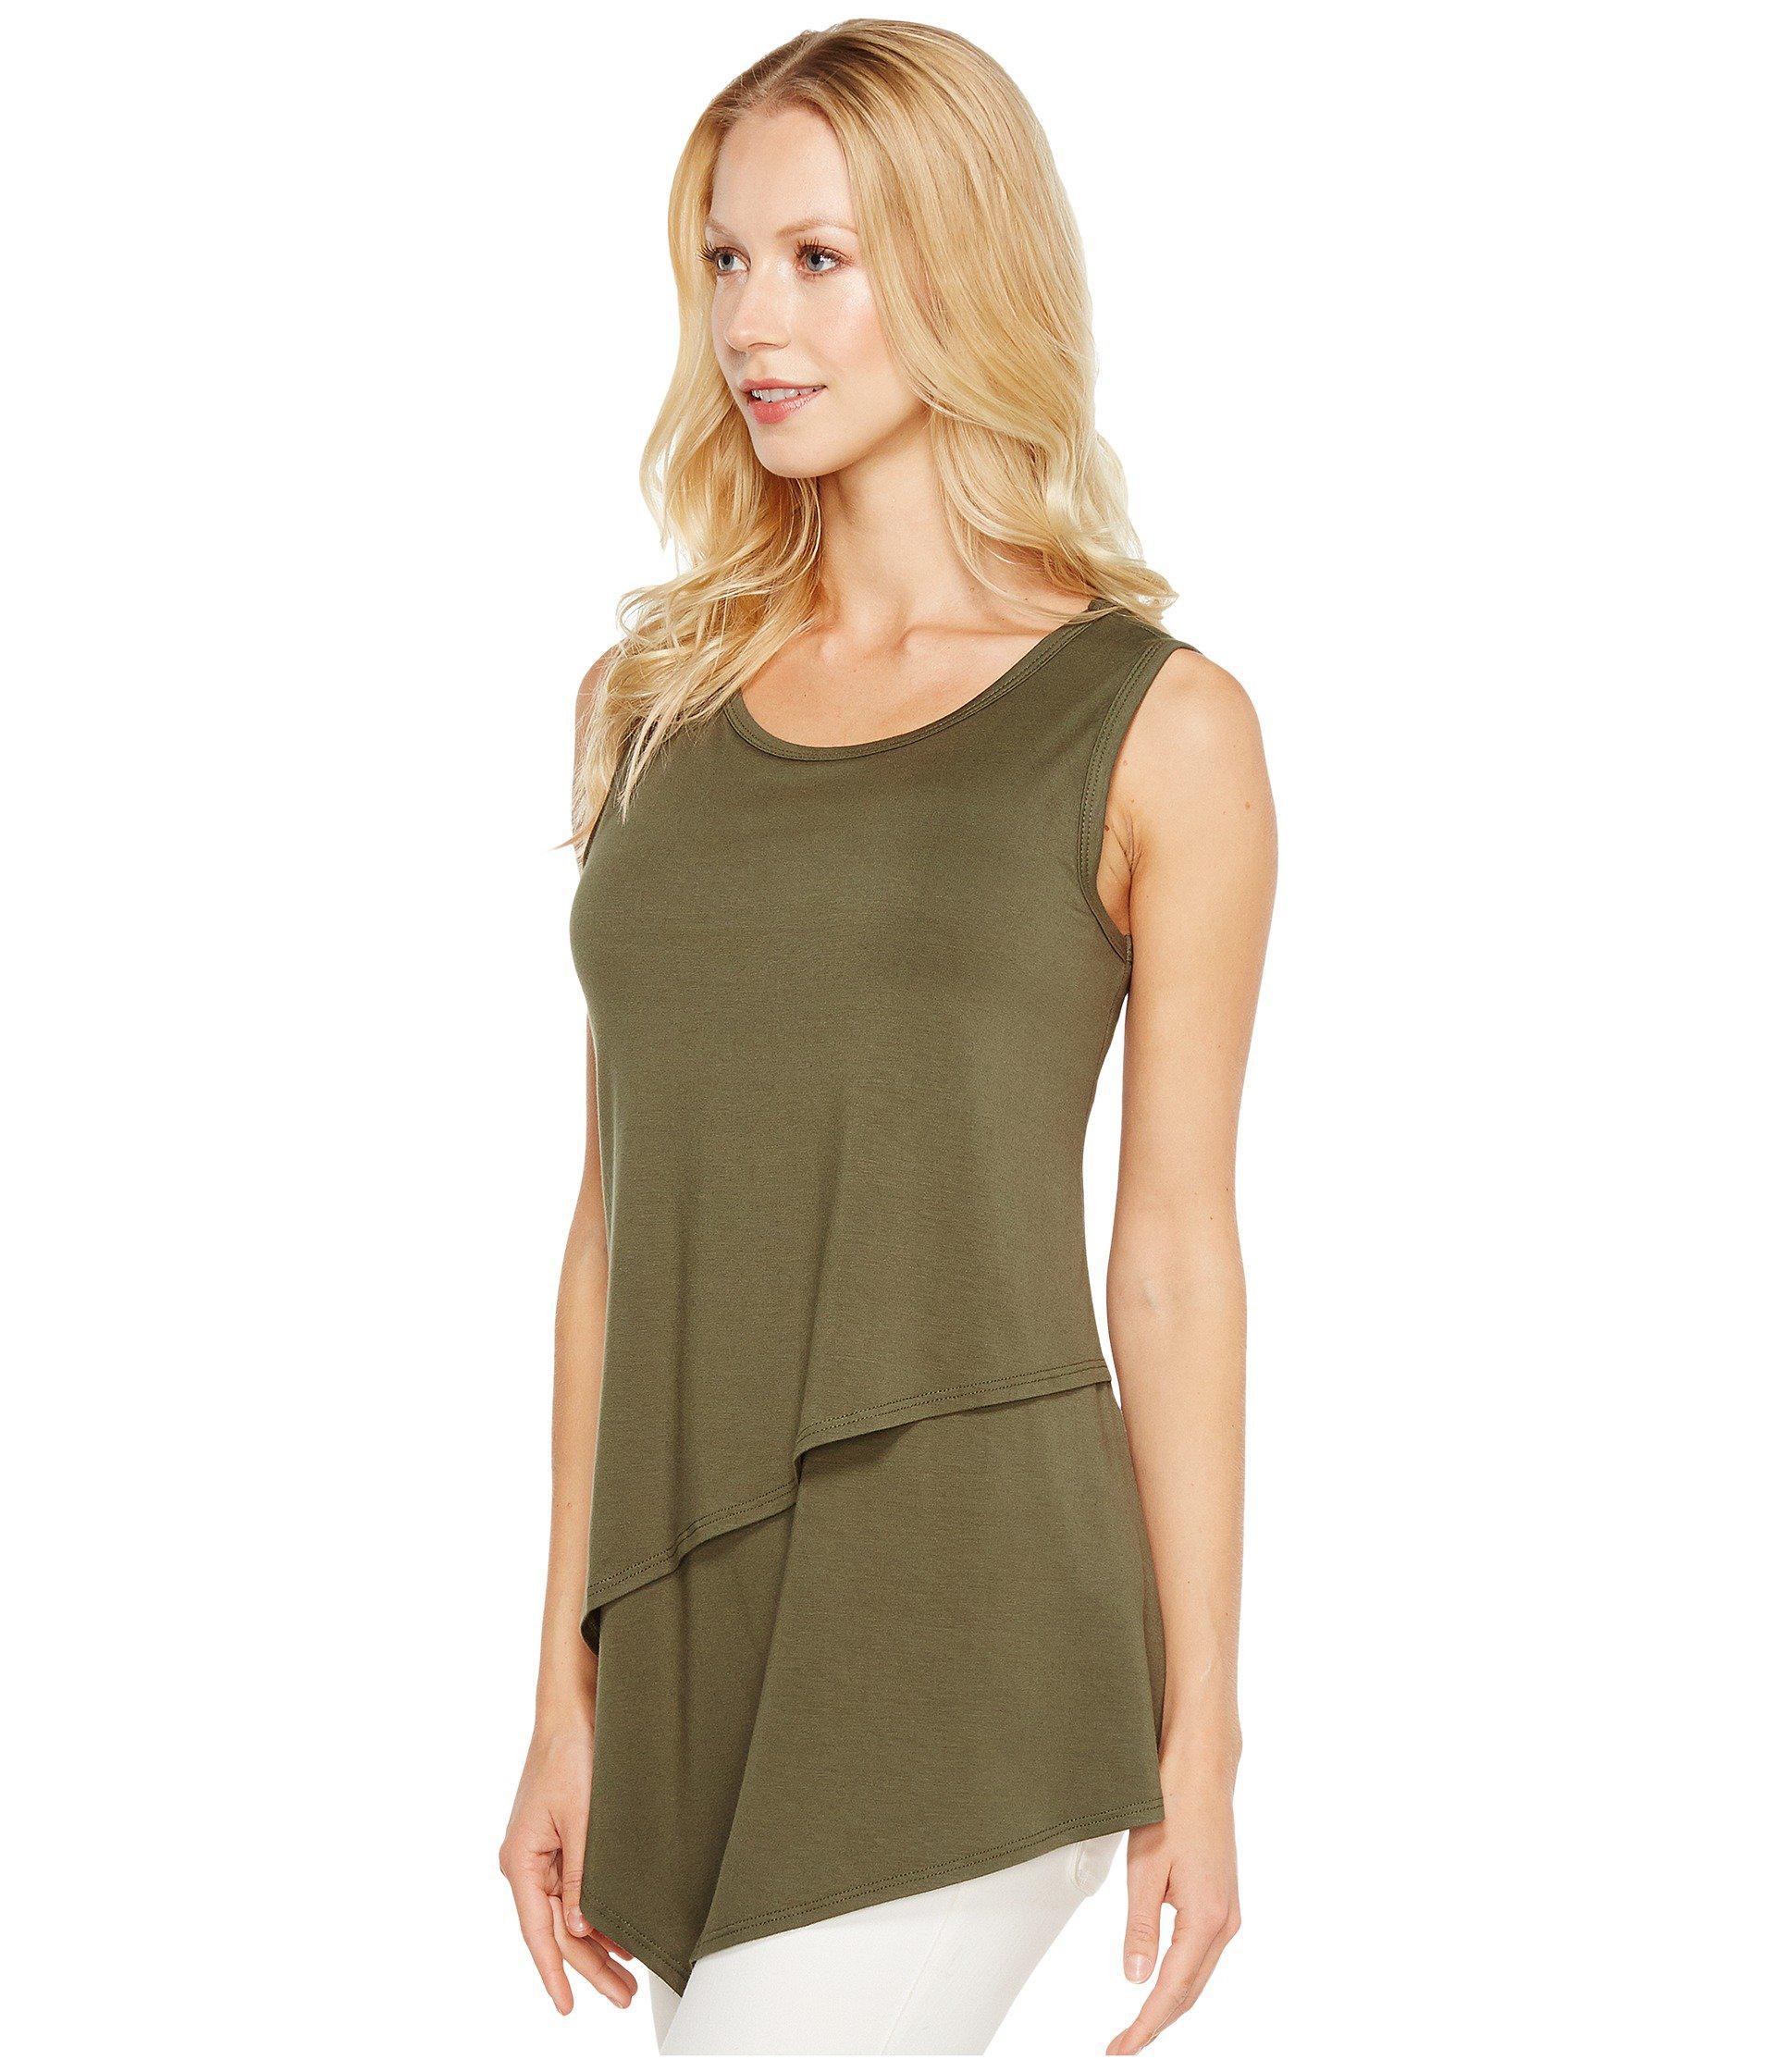 ee1cfb554e510 Lyst - Karen Kane Asymmetric Layer Top in Green - Save 37%